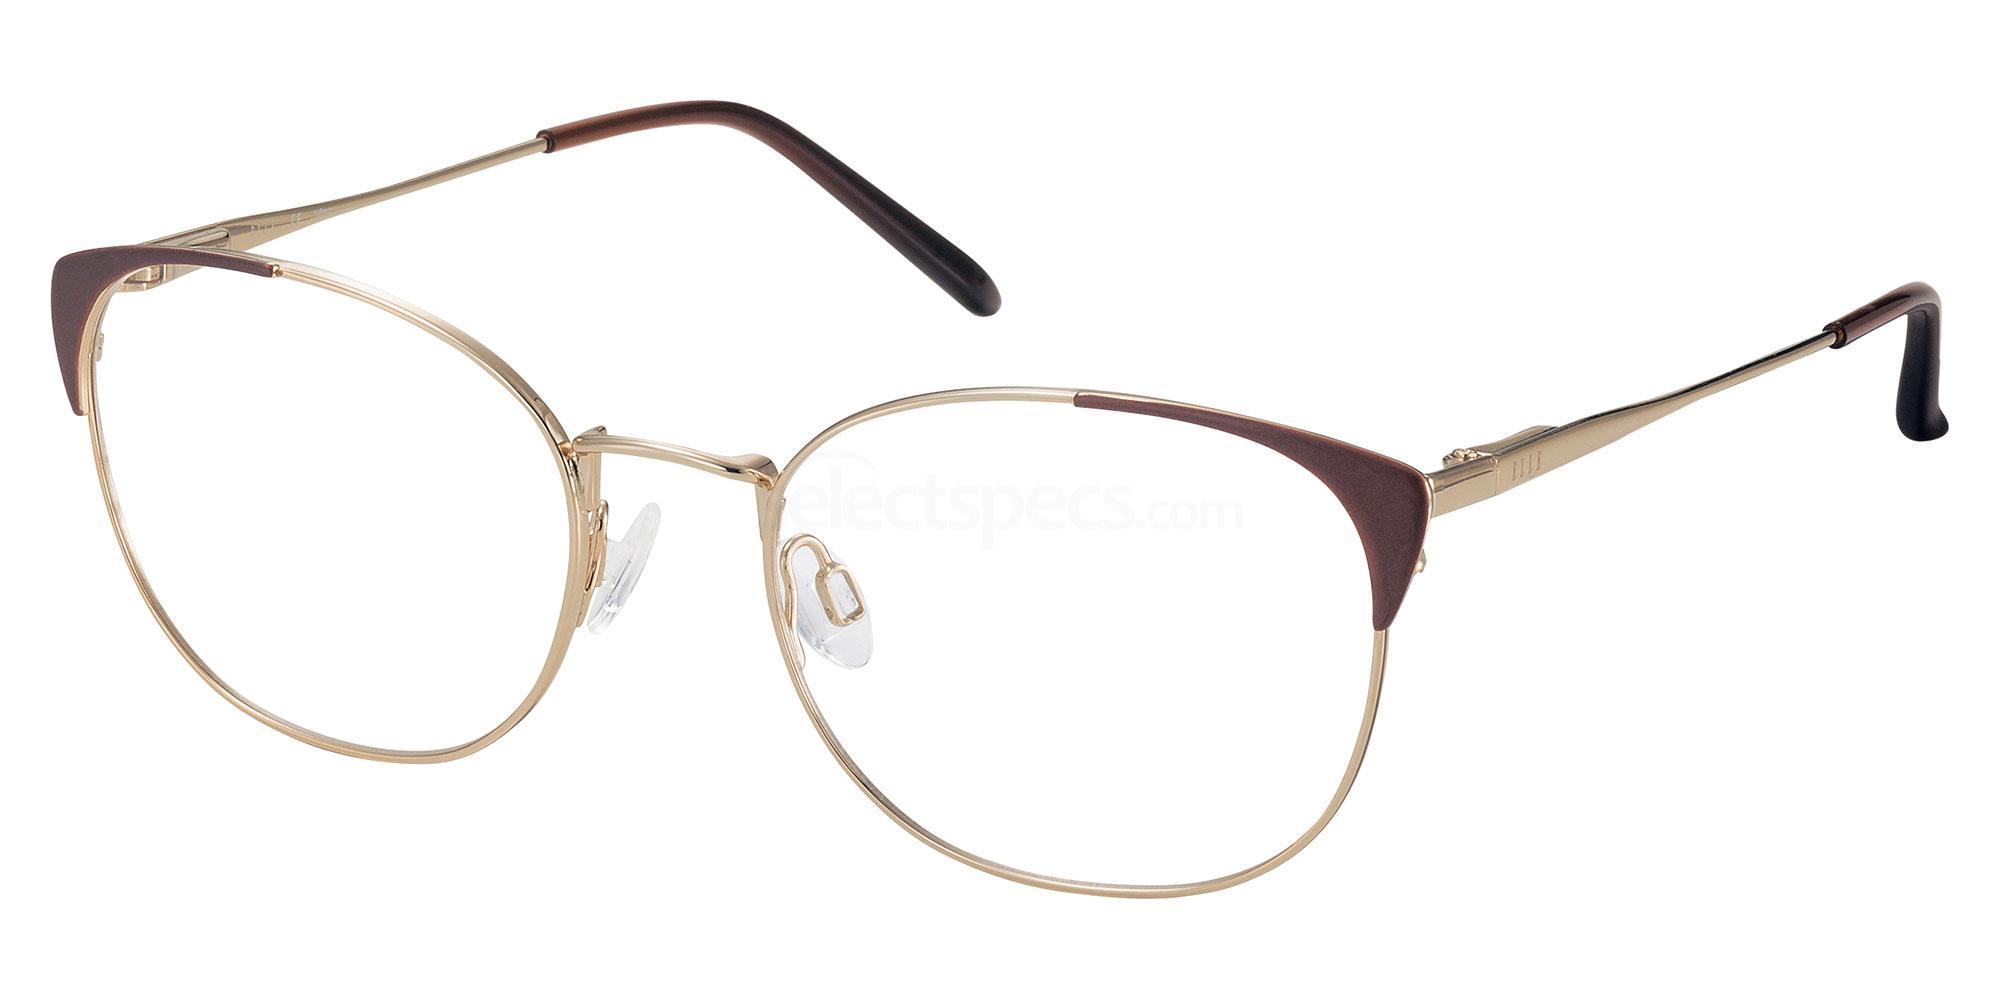 GD EL13475 Glasses, ELLE